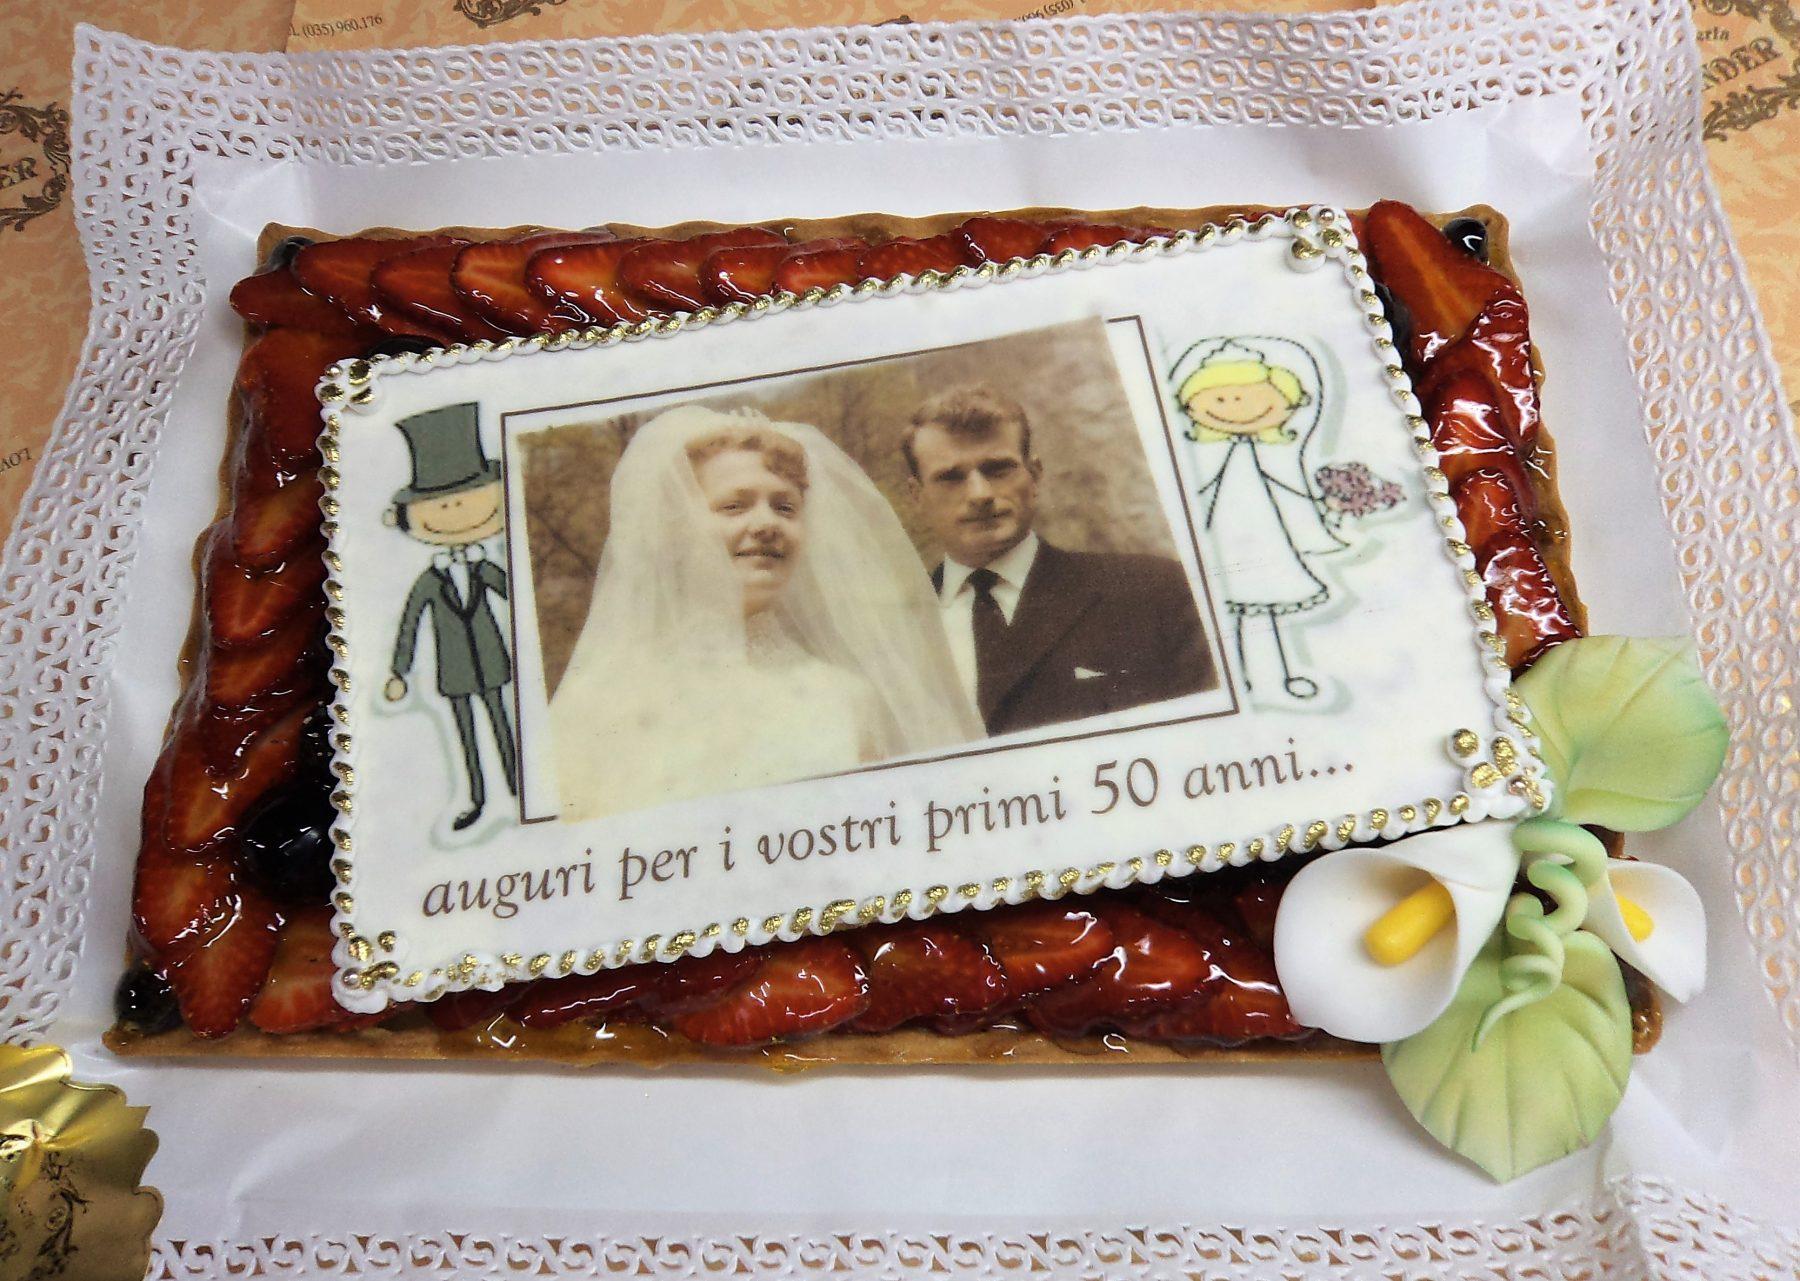 torta con stampa14